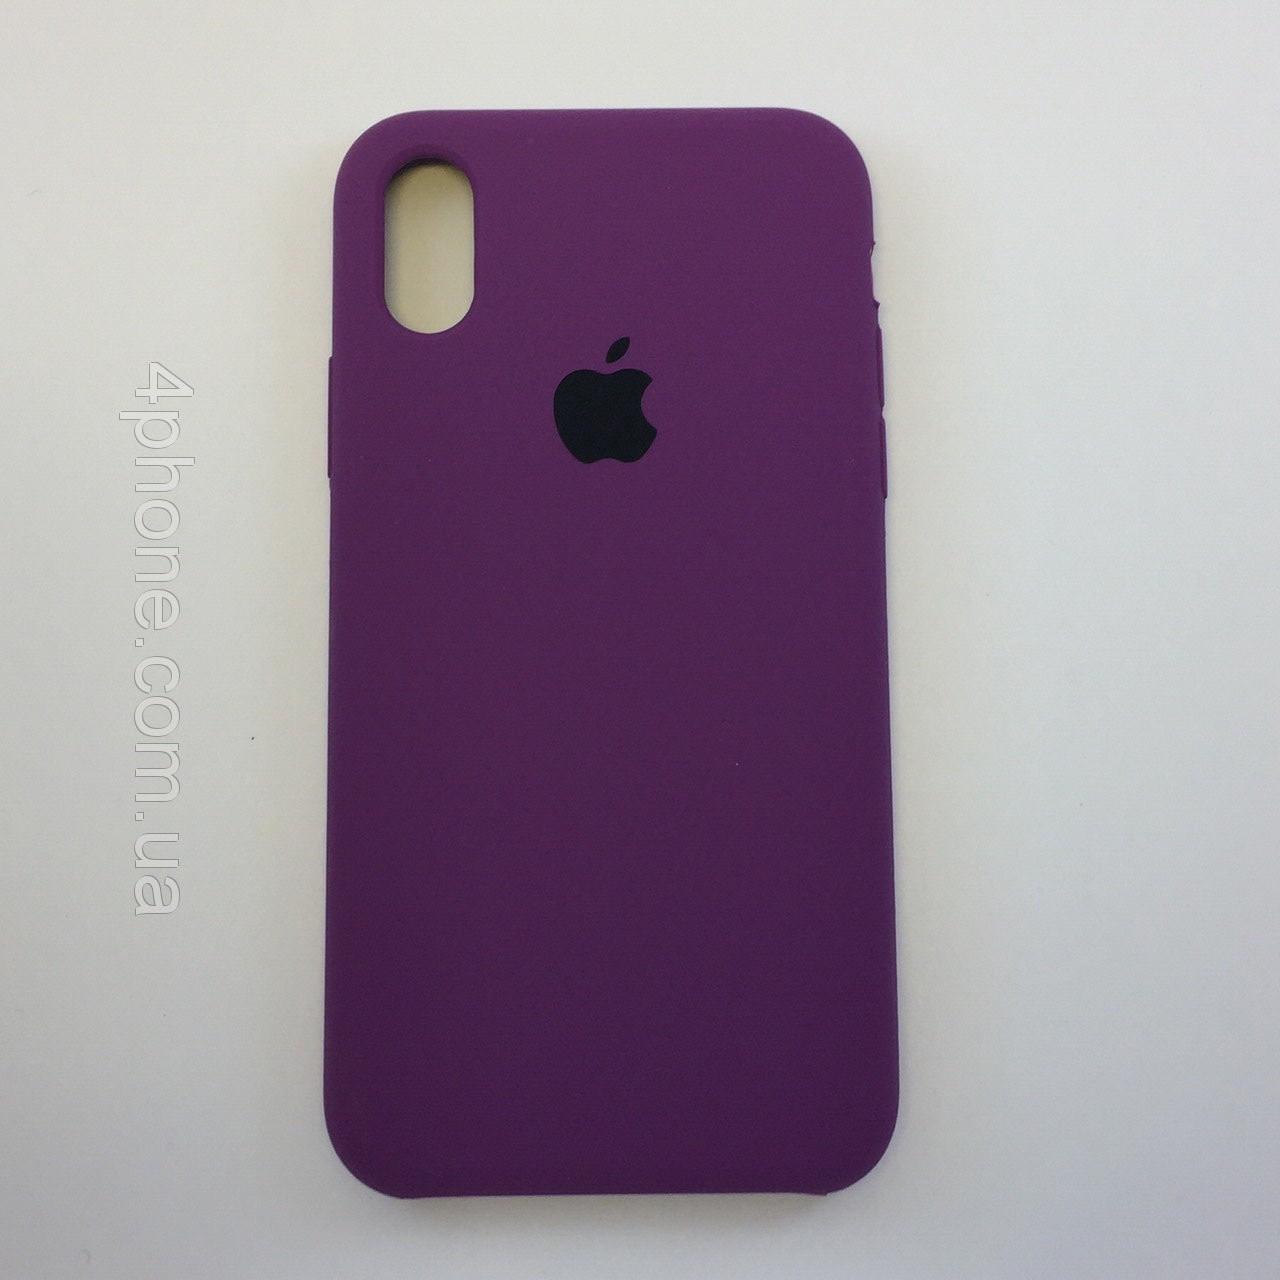 "Чехол - Silicon Case для iPhone ""Пурпурный- №45"" - copy orig."